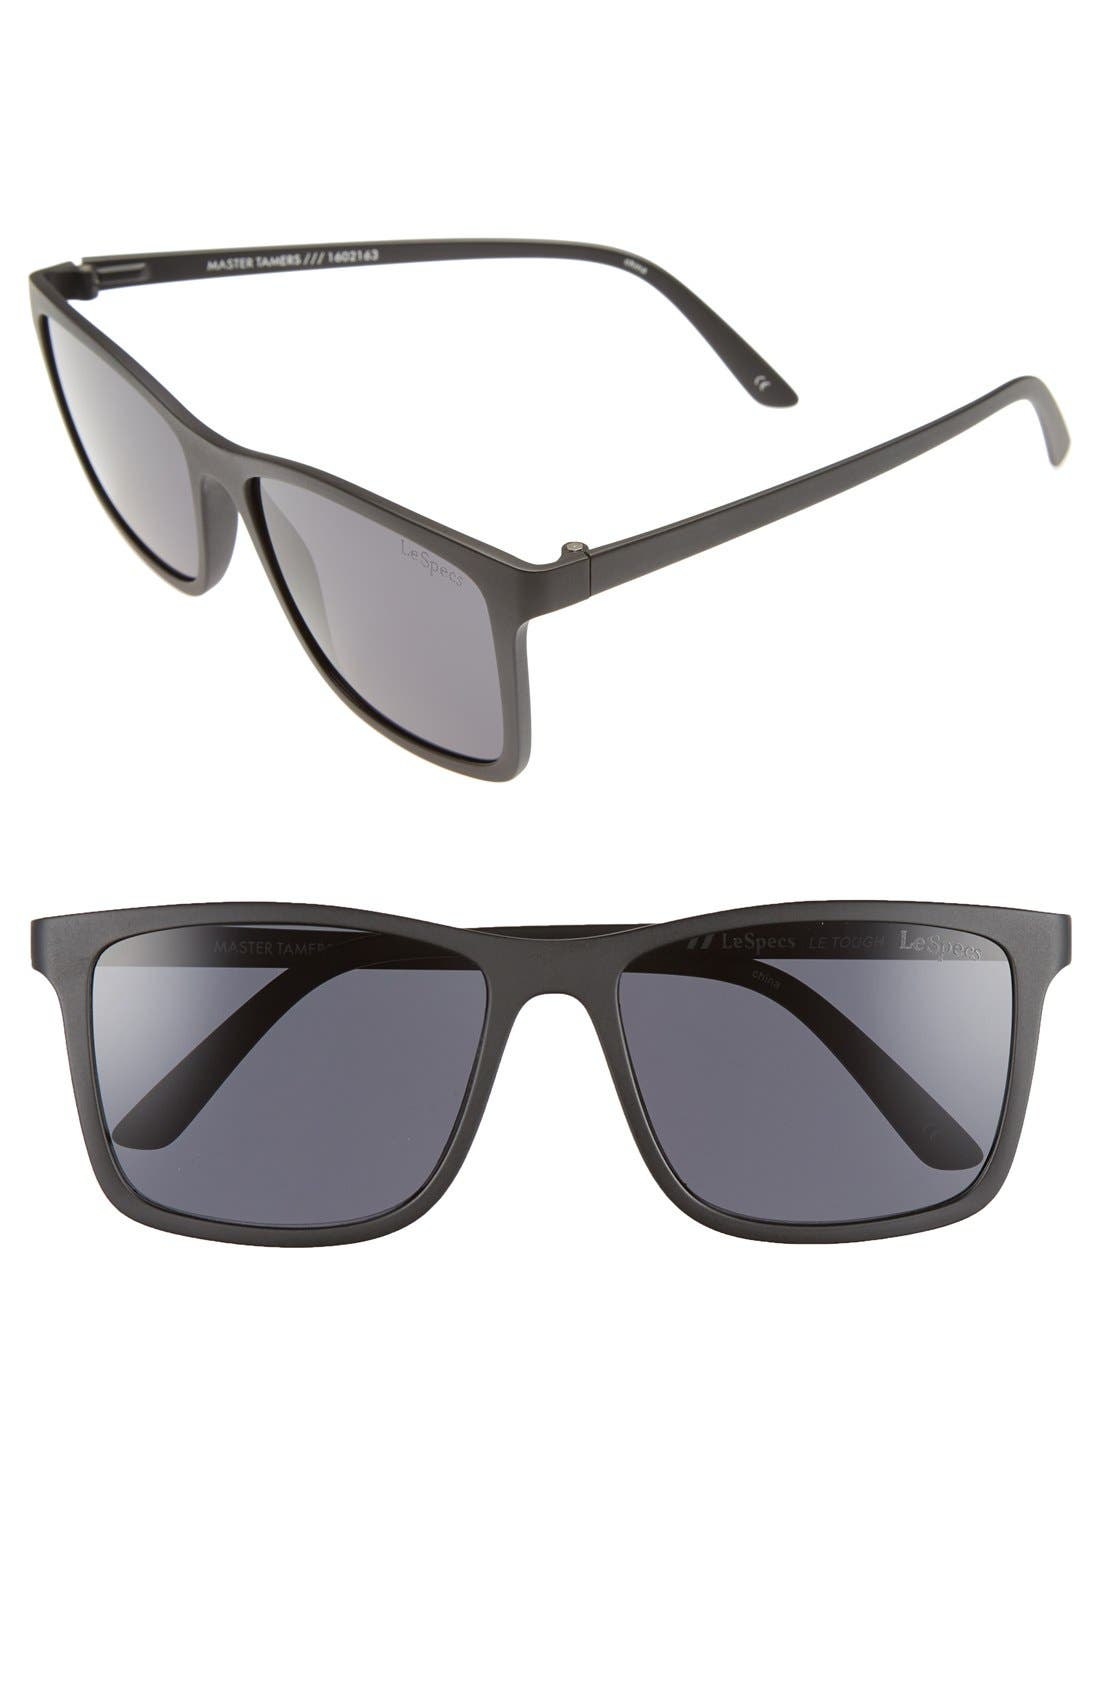 Le Specs 'Master Tamers' 56mm Sunglasses